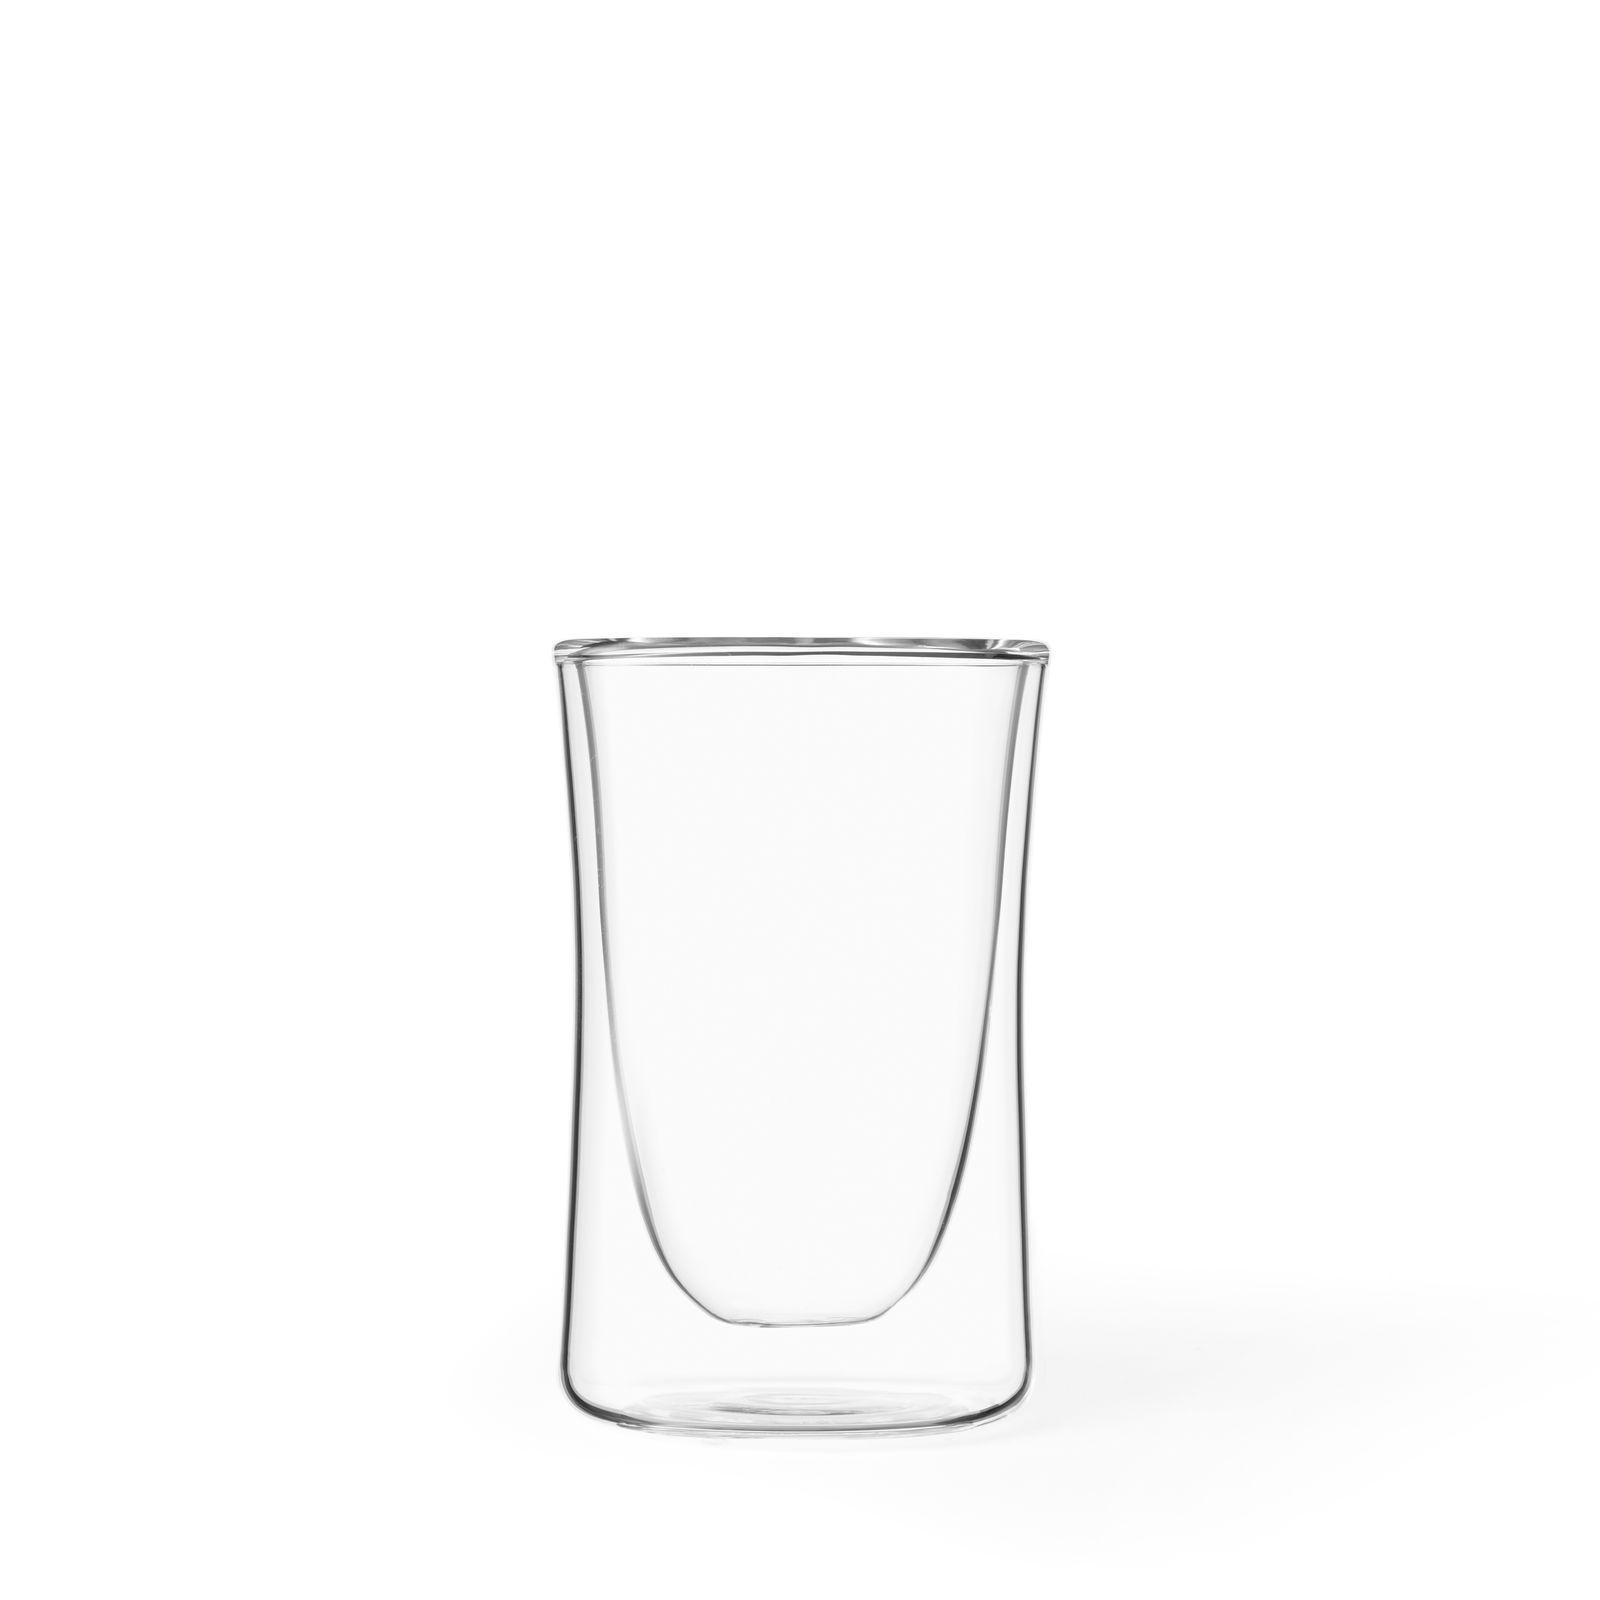 Viva Classic Curve Thermo Glas 250 ml Set van 2 Stuks